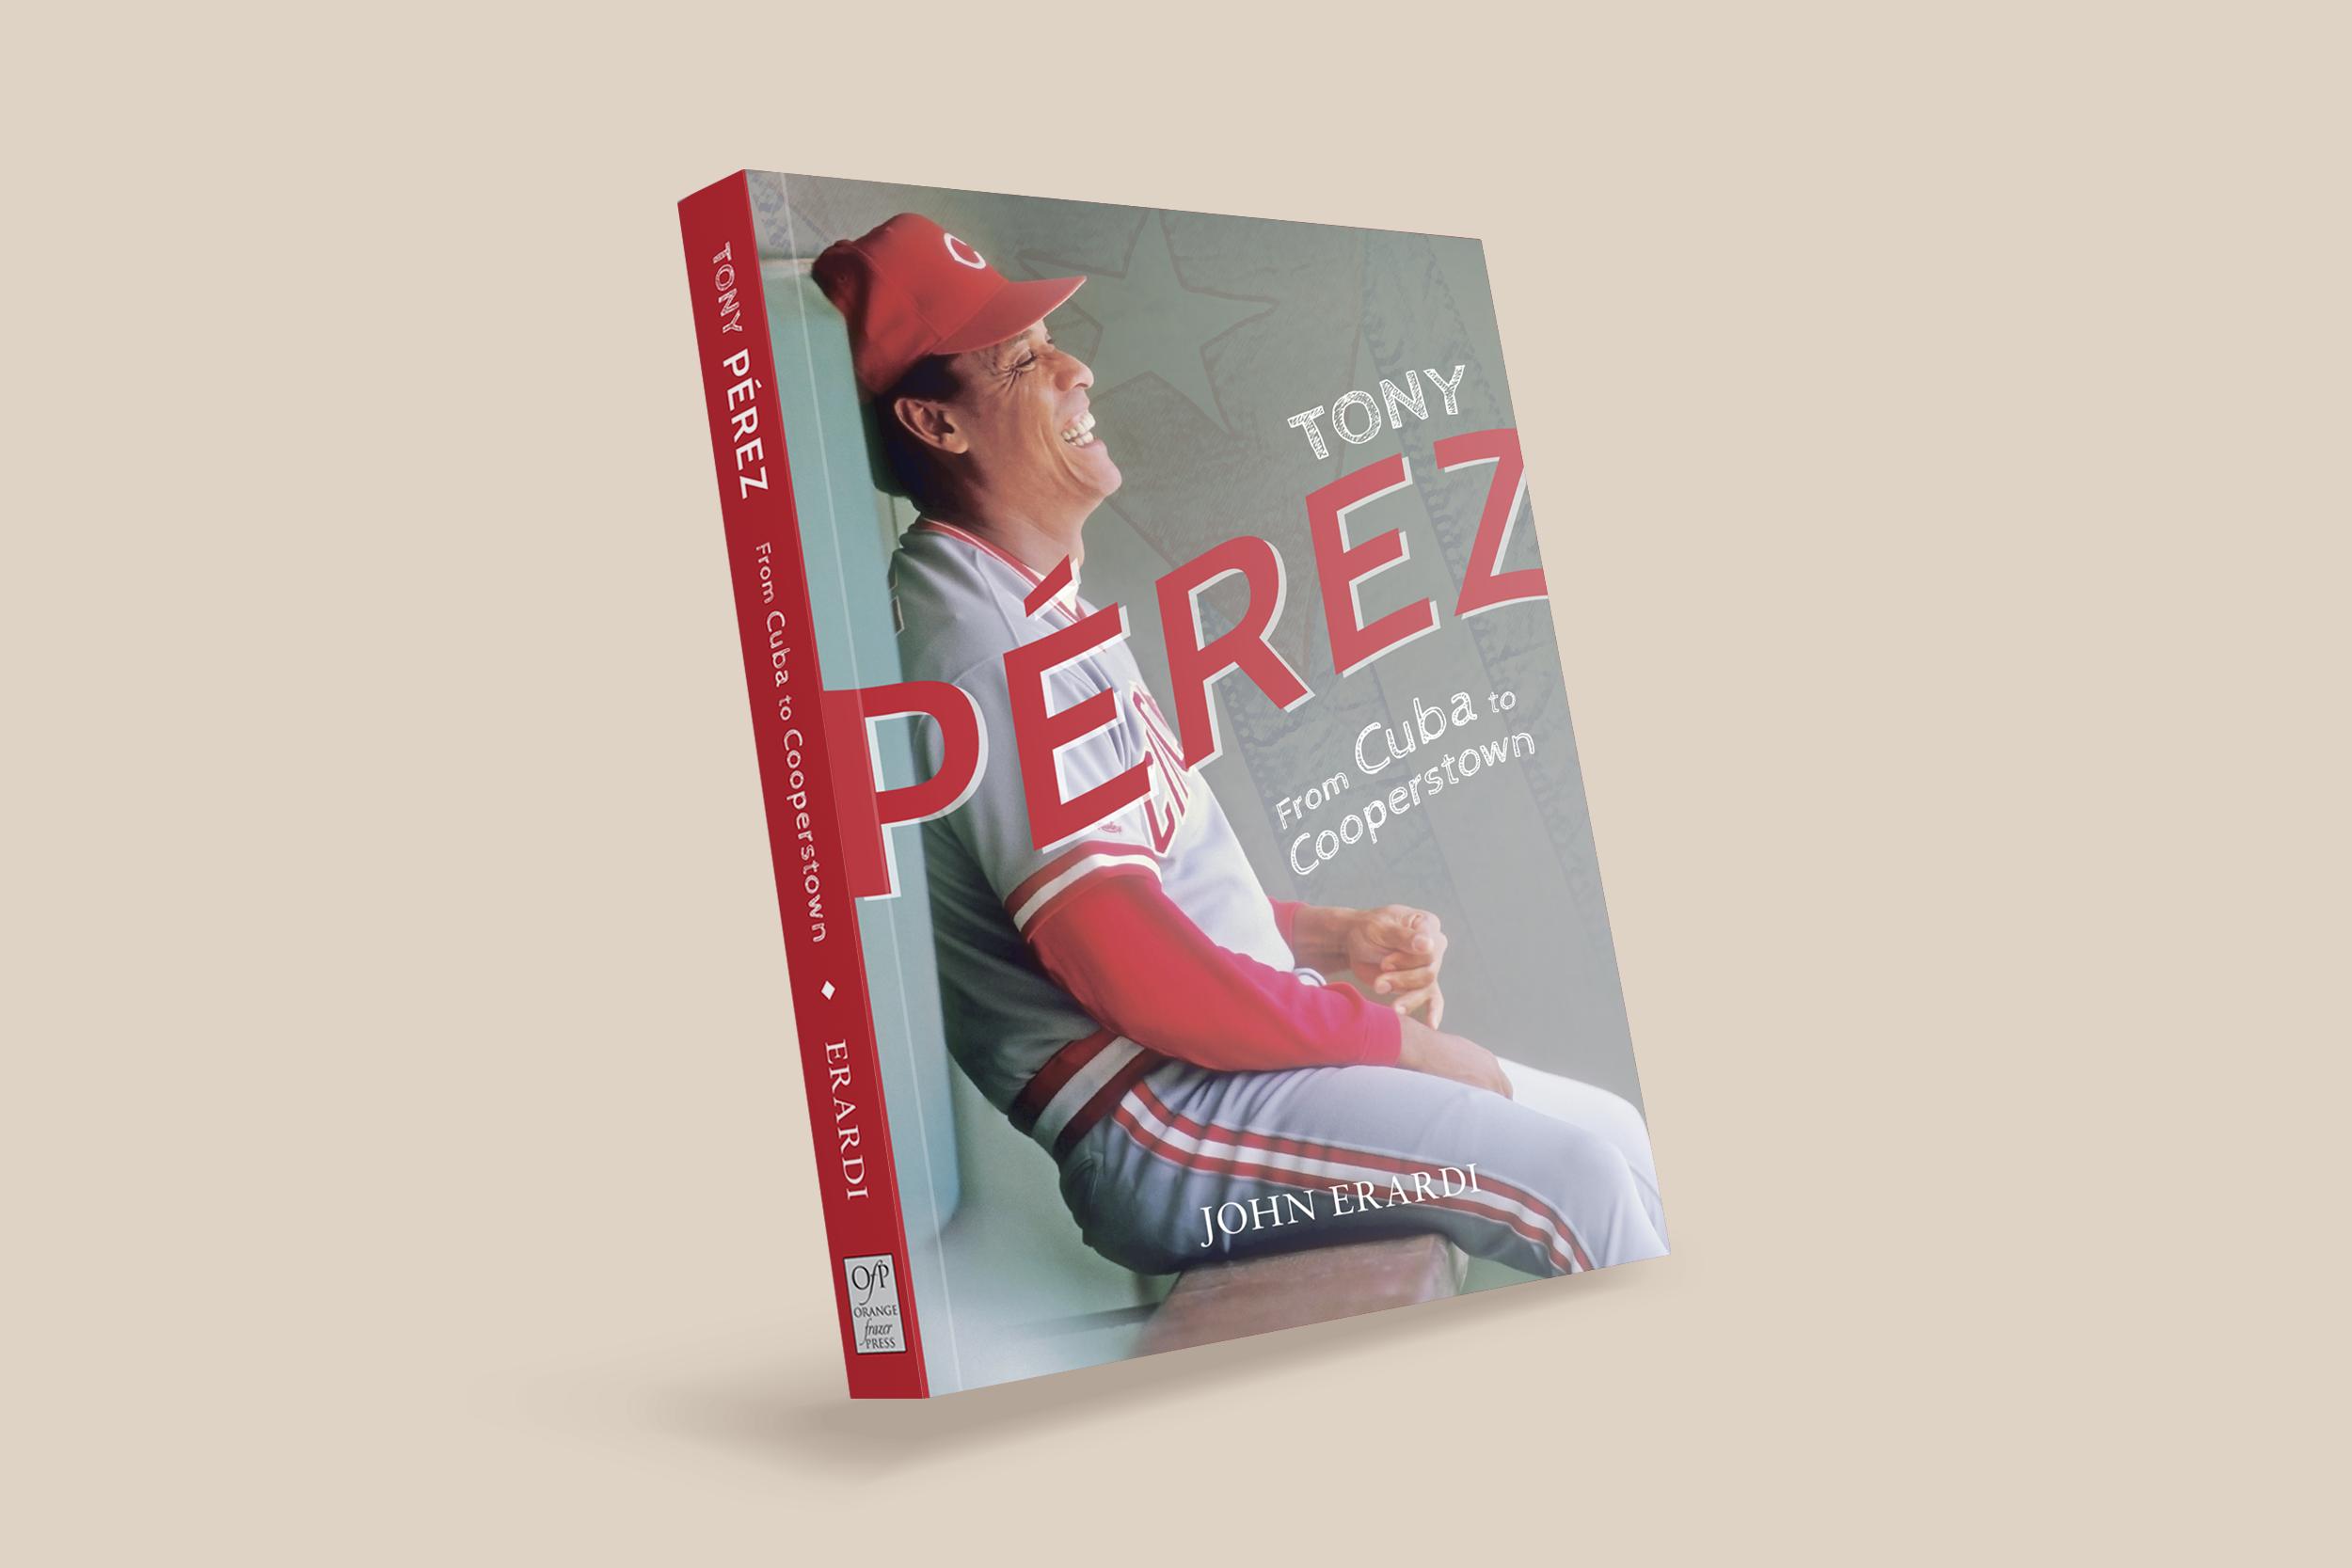 Tony_Perez_Book_Front.png